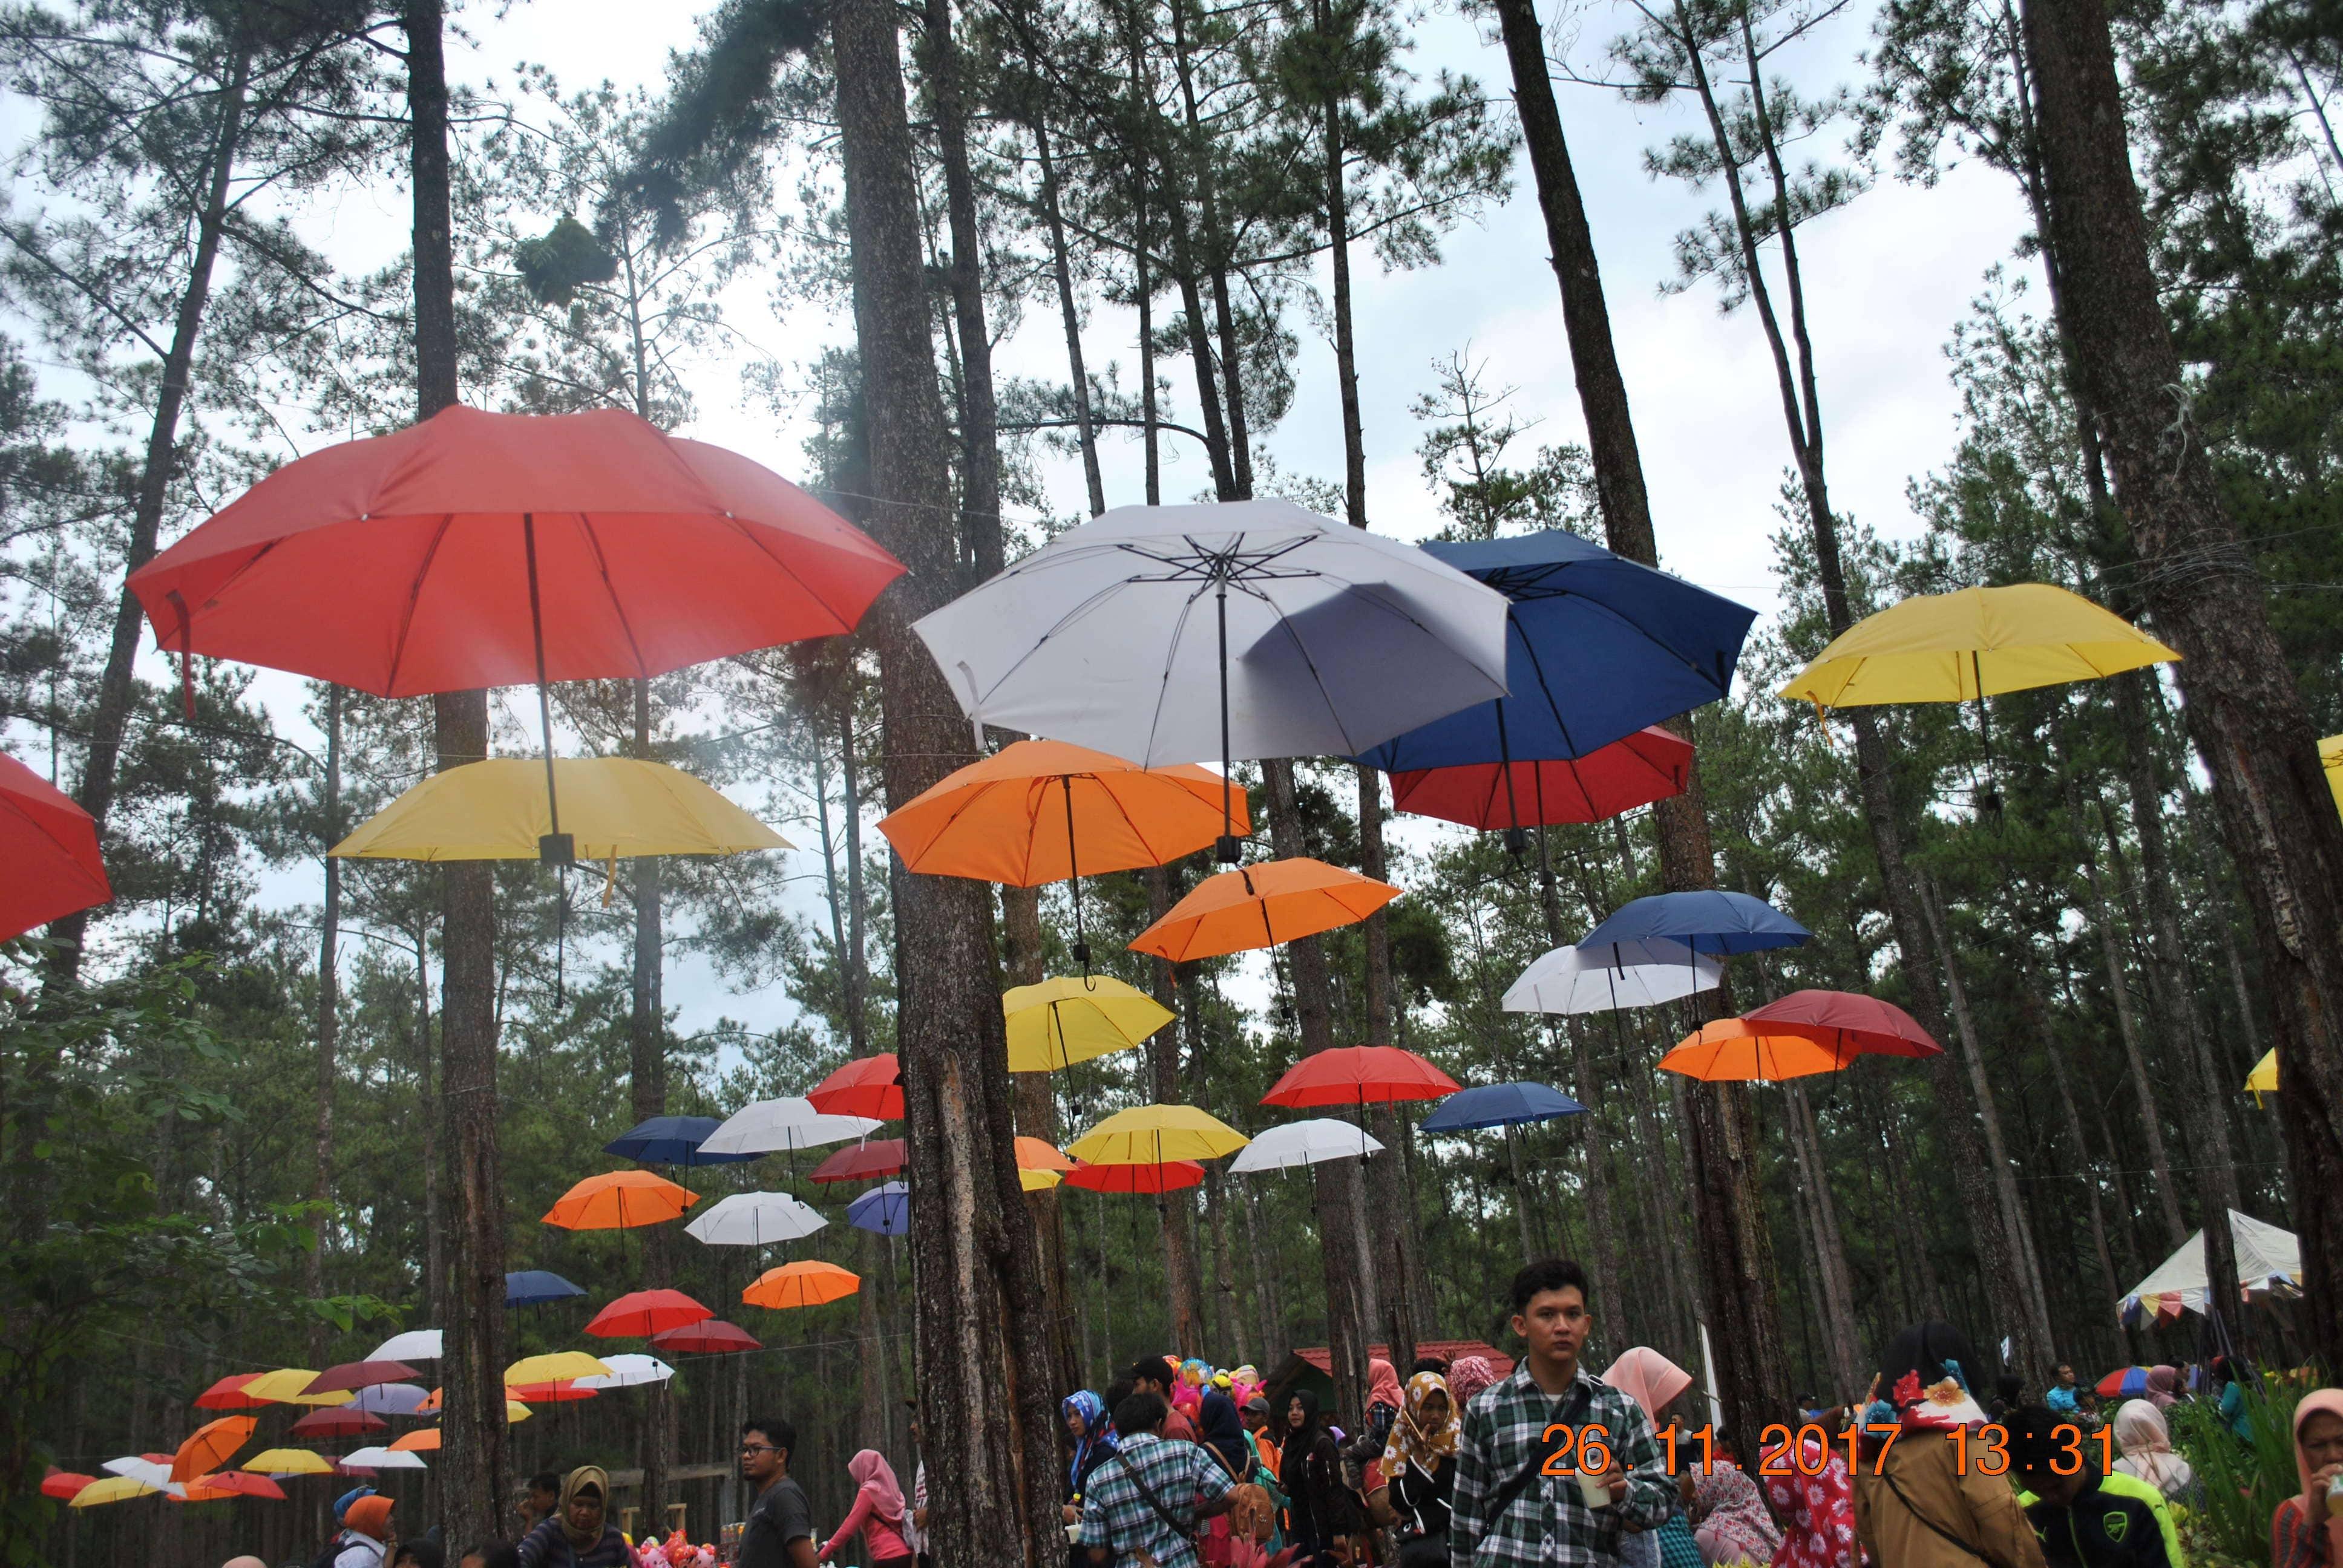 Kemit Forest Destinasi Wisata Terletak Cilacap Education Desa Karang Gedang